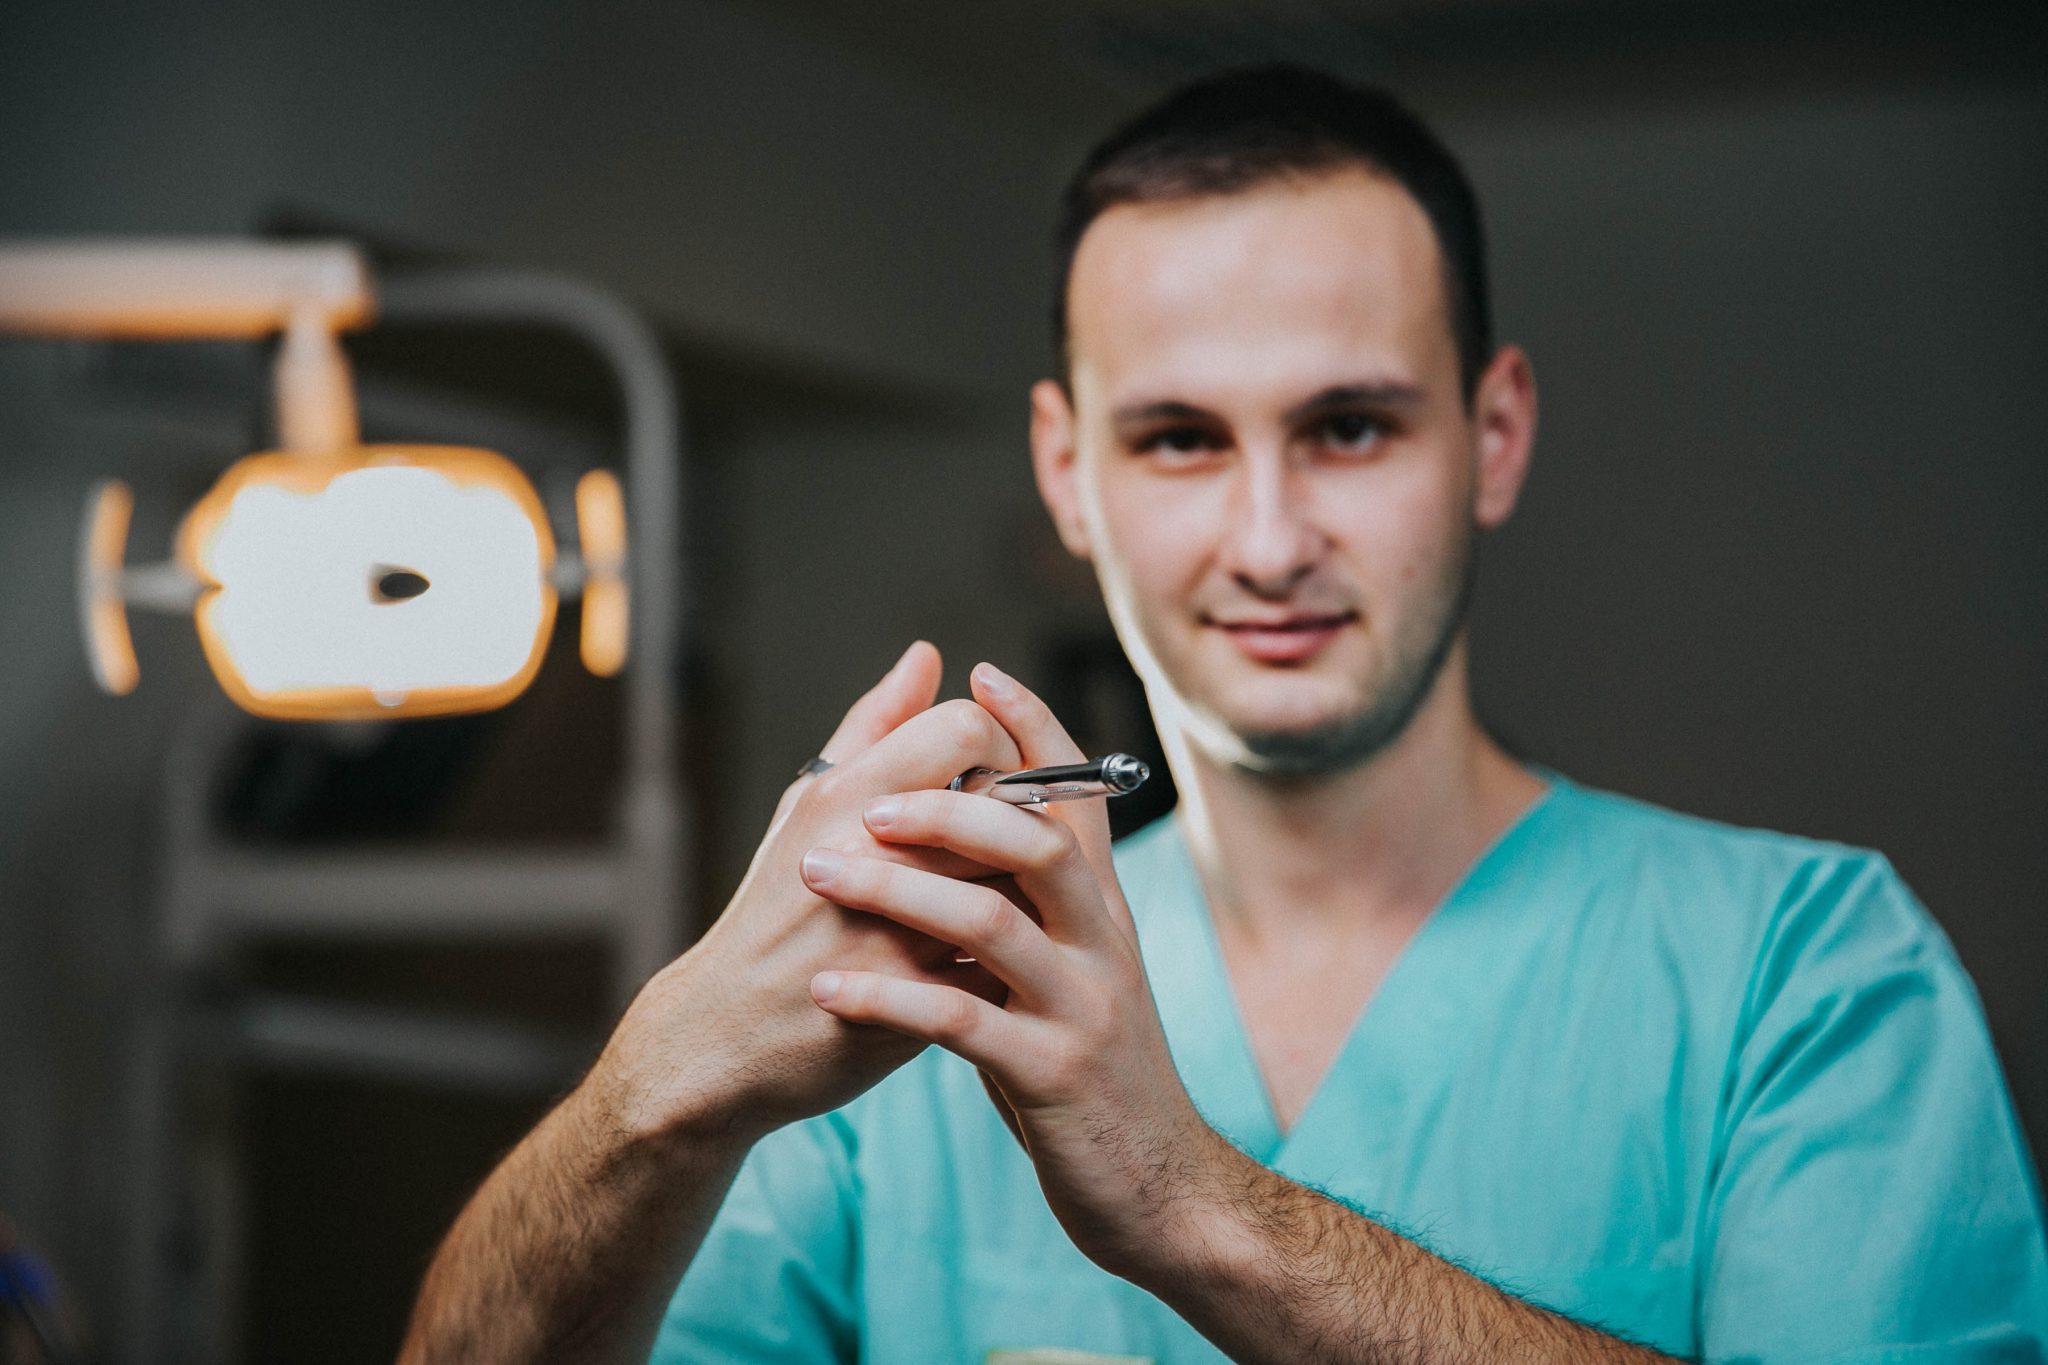 facultatea de stamatologie targu mures UMF absolvenit stamatolog medic doctor fotografie comerciala fotograf profesionist majos daniel_-20